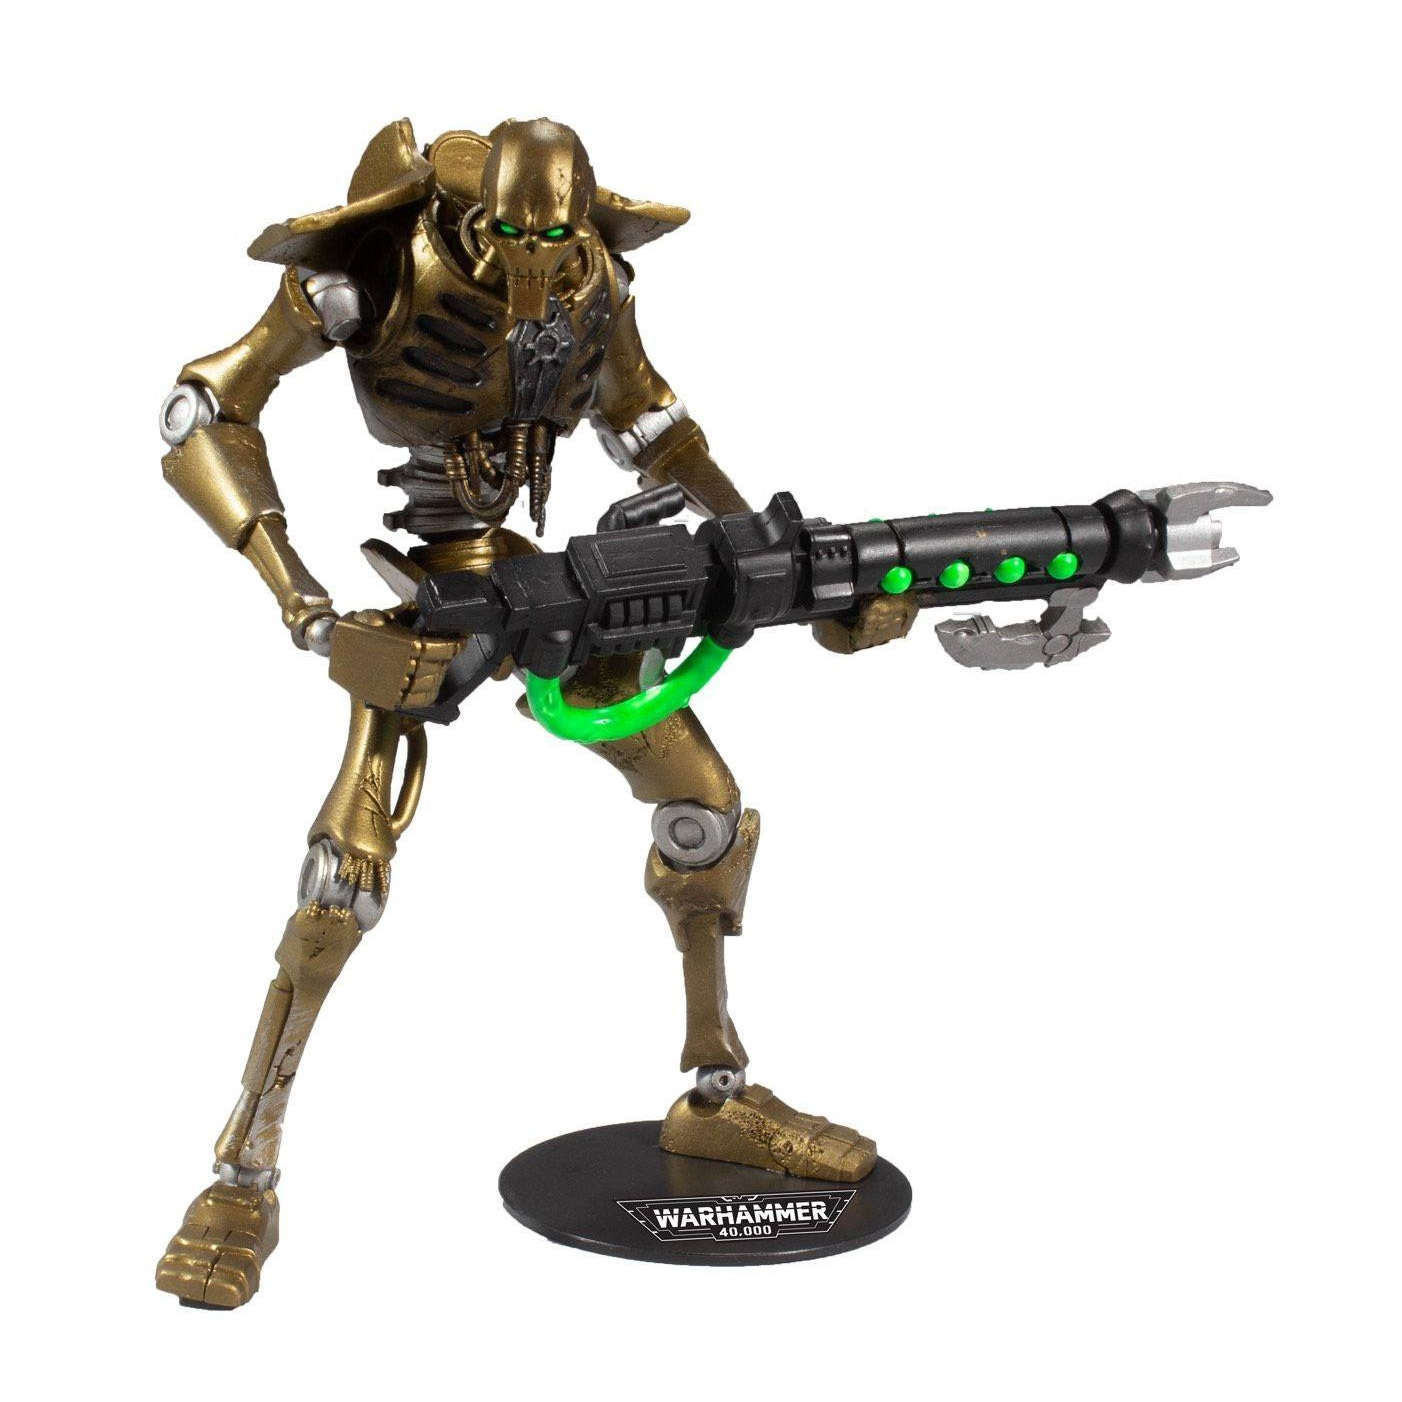 Action Figure: Warhammer 40k NECRON by McFarlane Toys